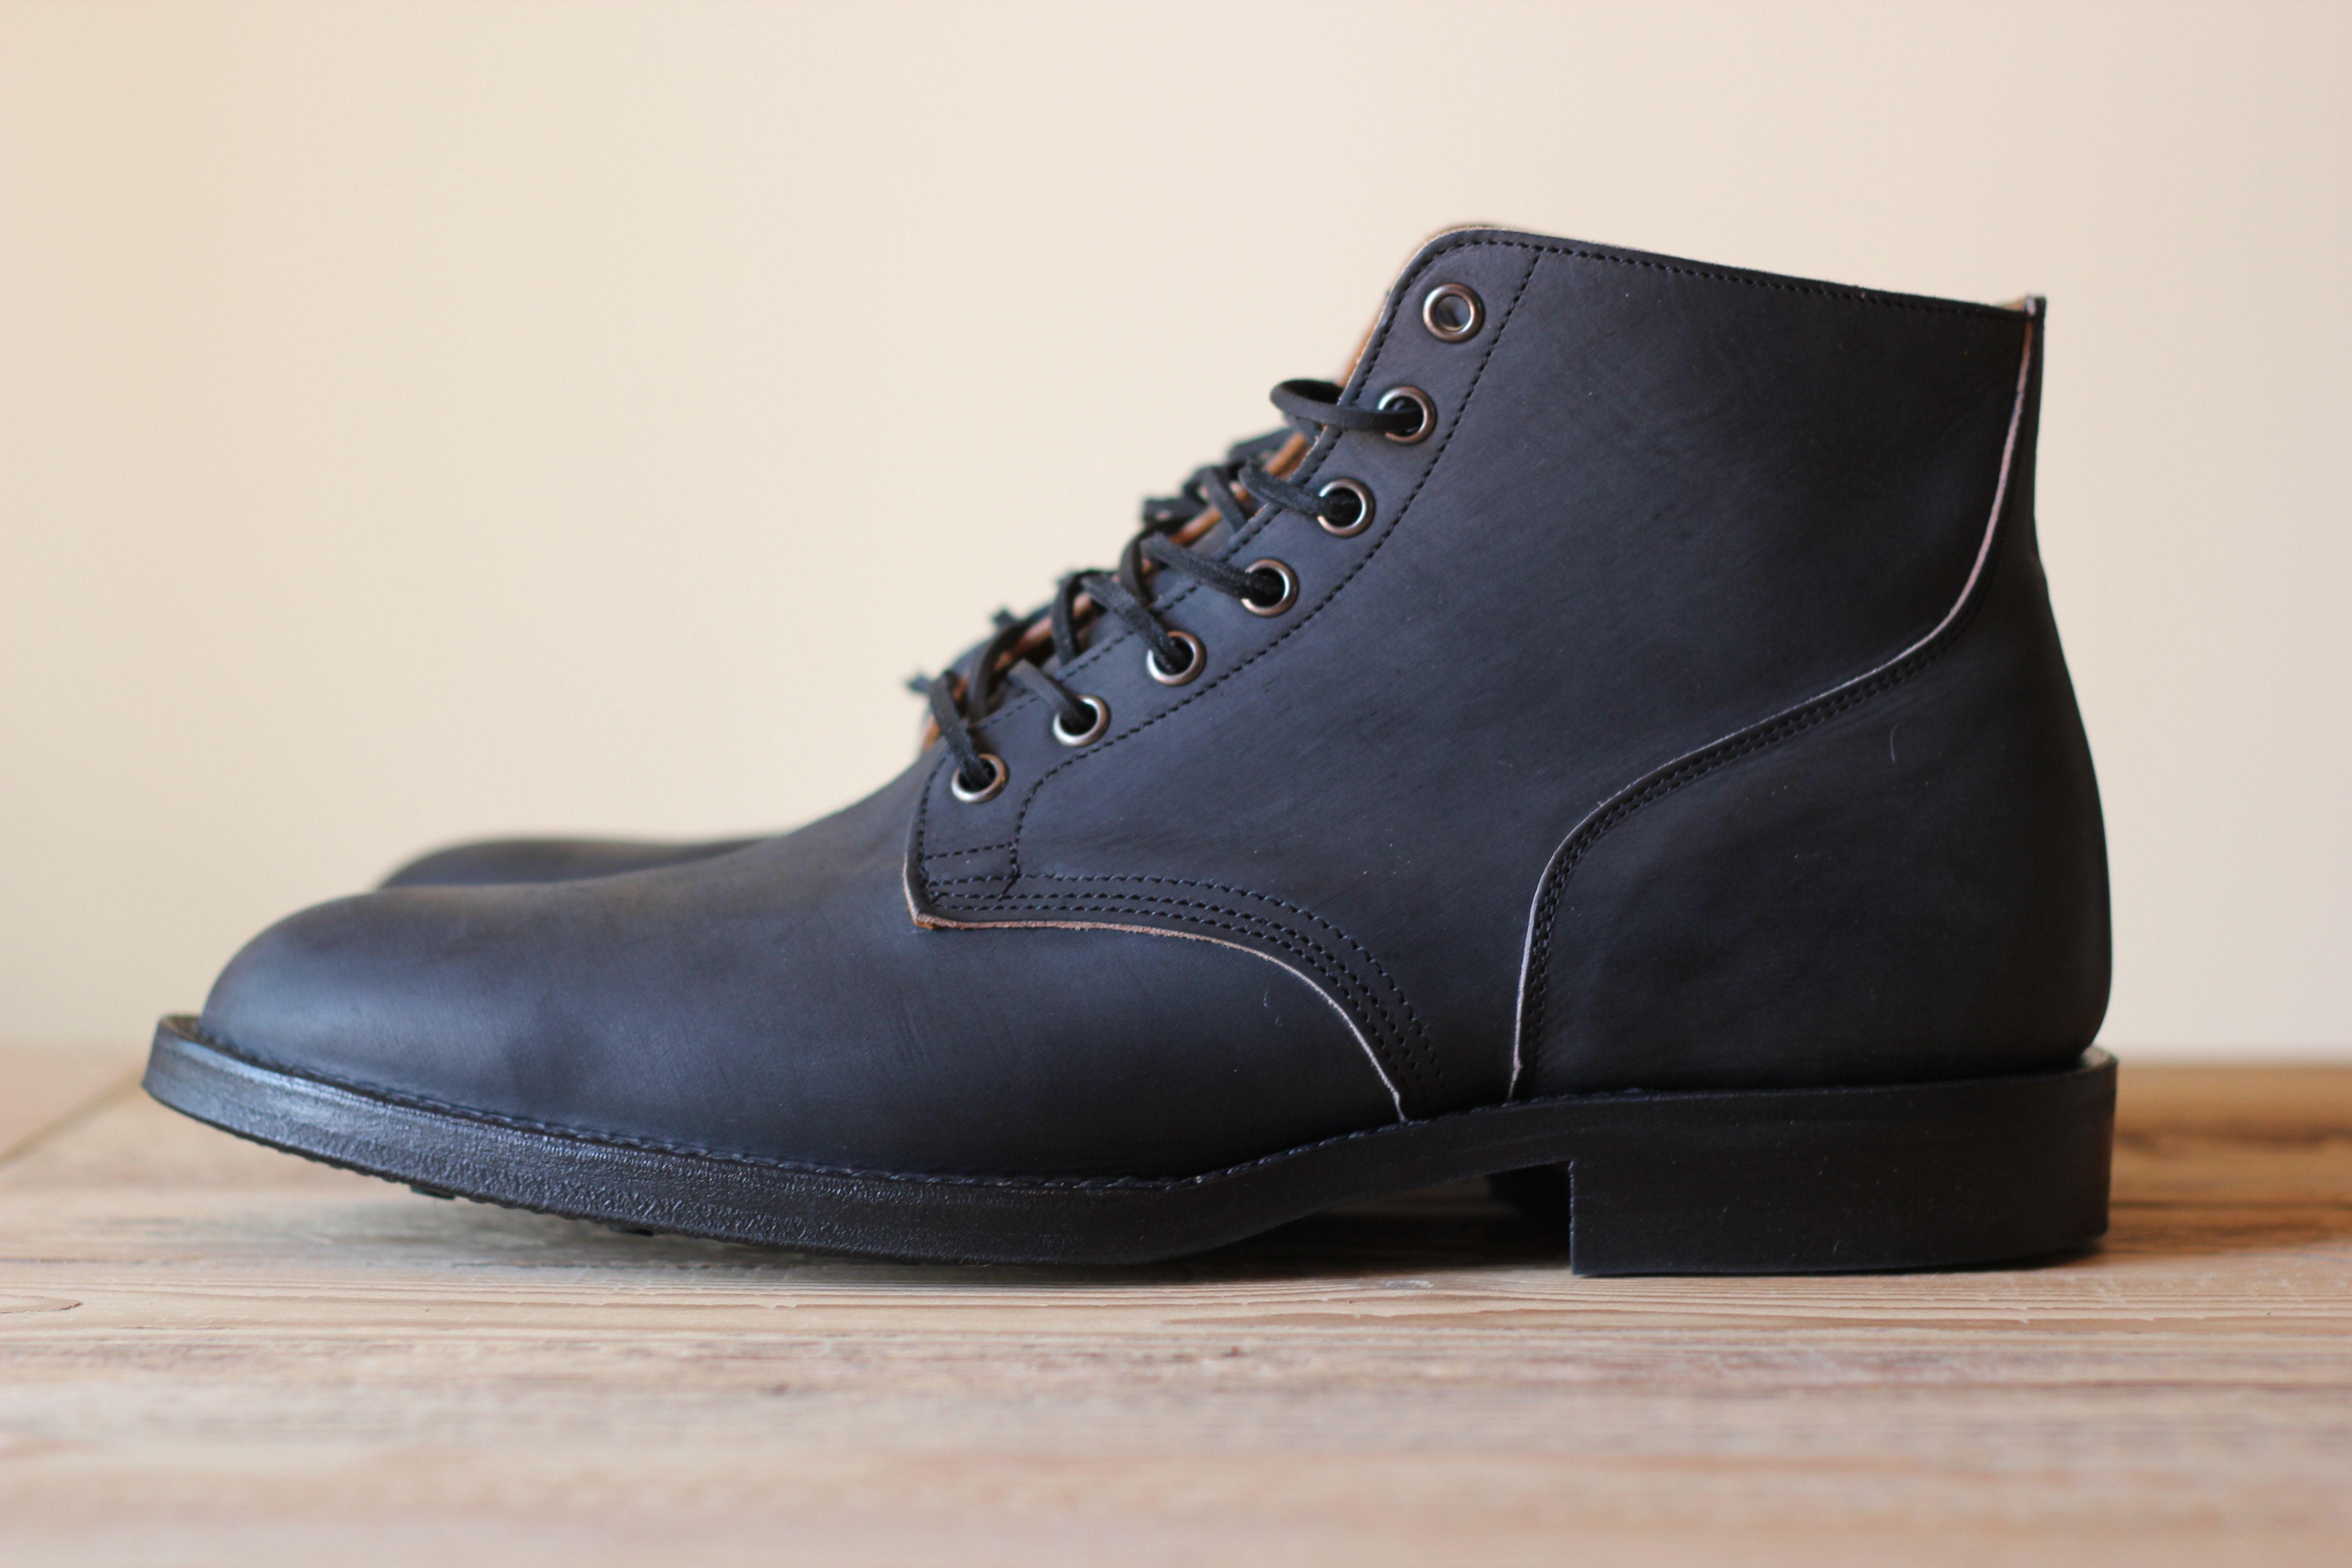 Viberg Matte Black Calf Service Boots